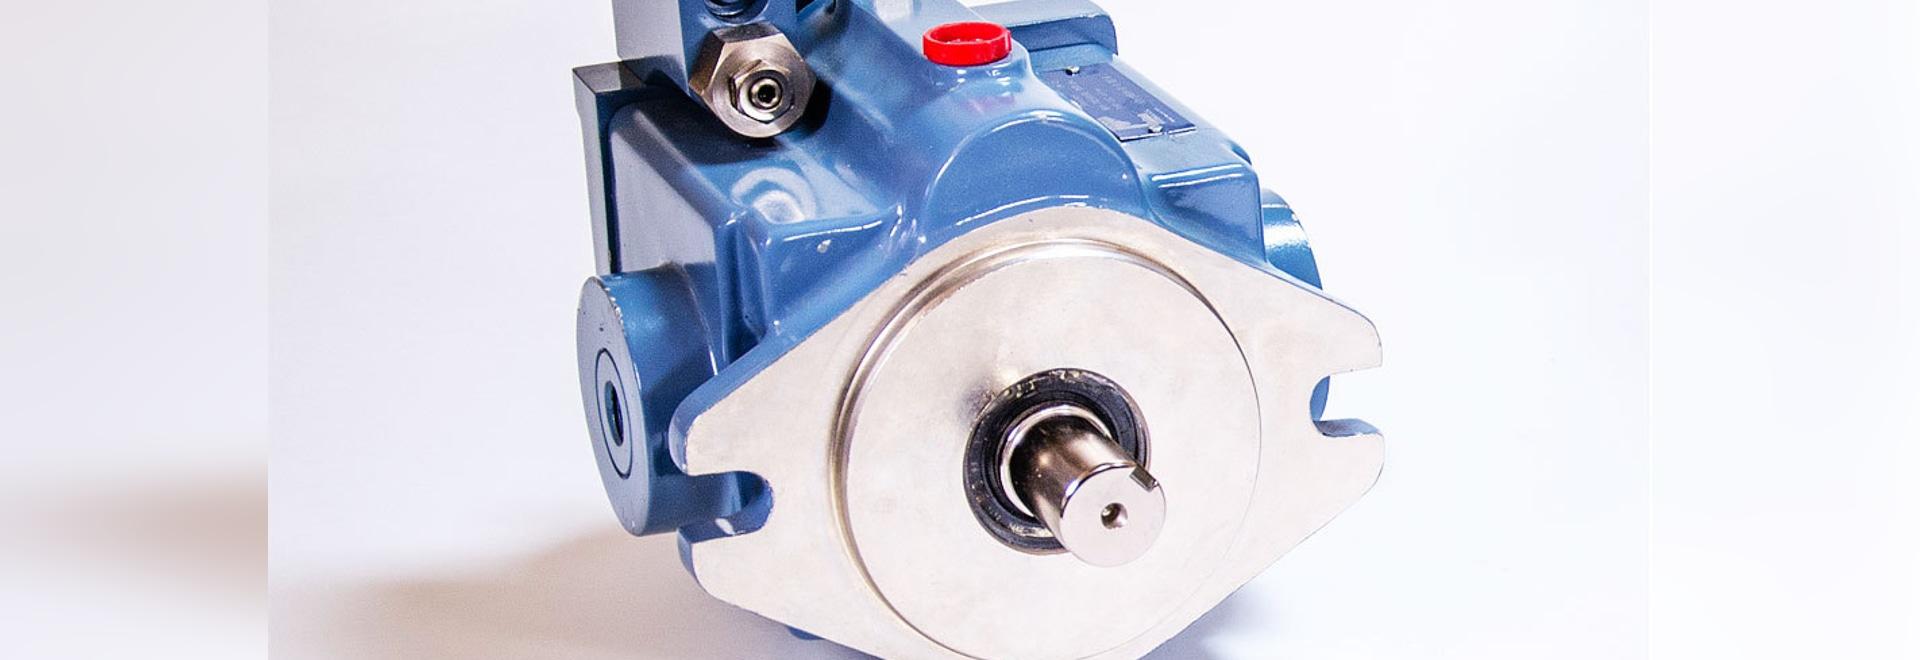 Continental Hydraulics HPVR piston pump